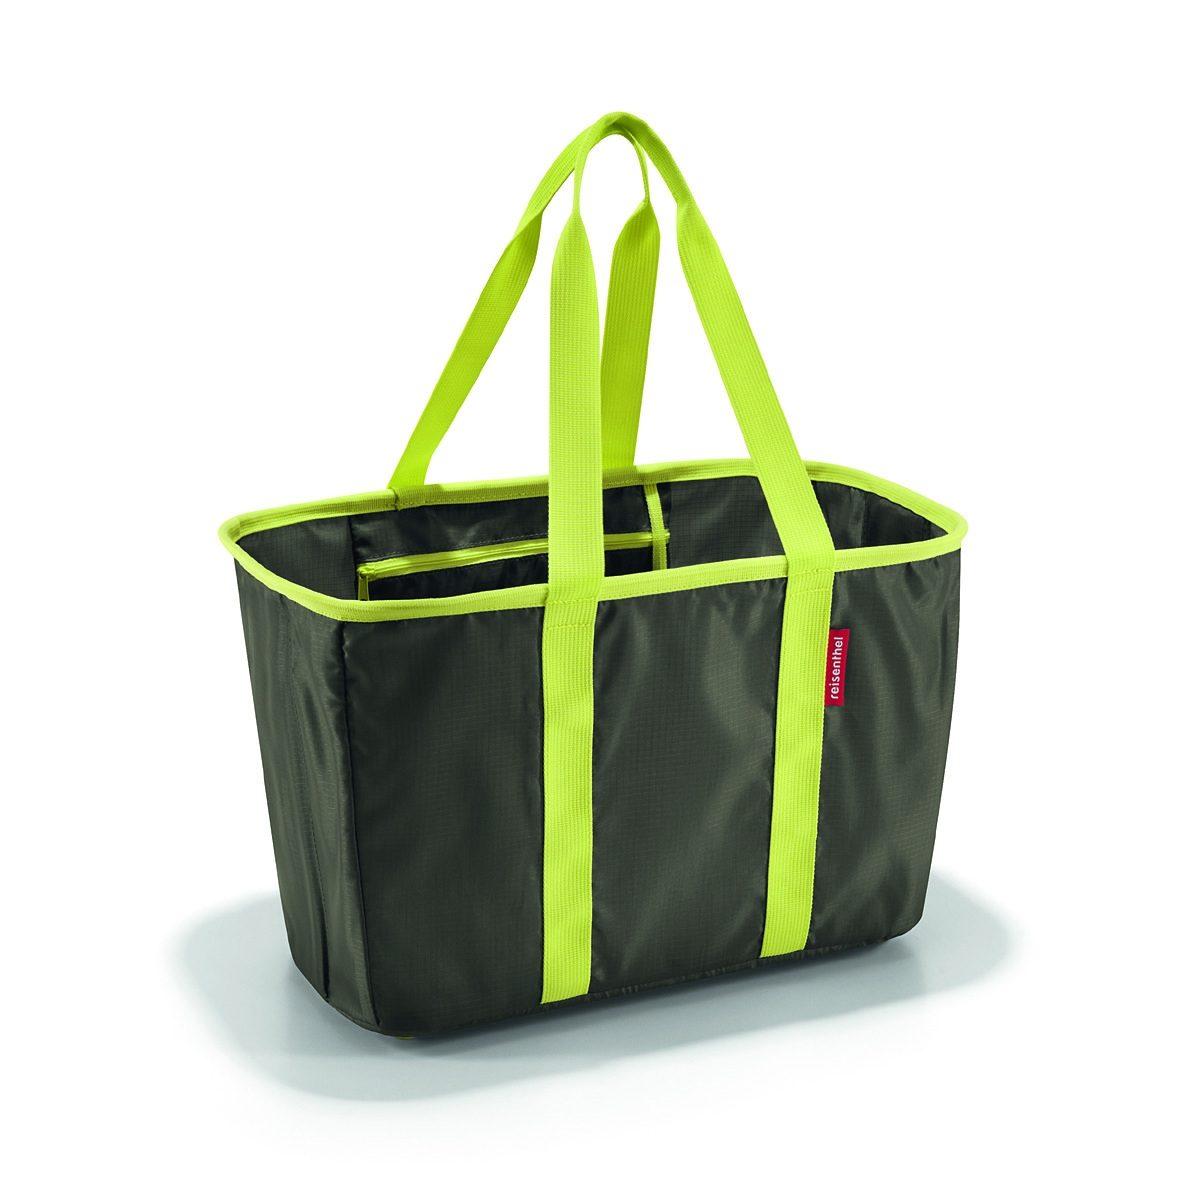 Reisenthel® Reisenthel Mini Maxi Basket dark olive